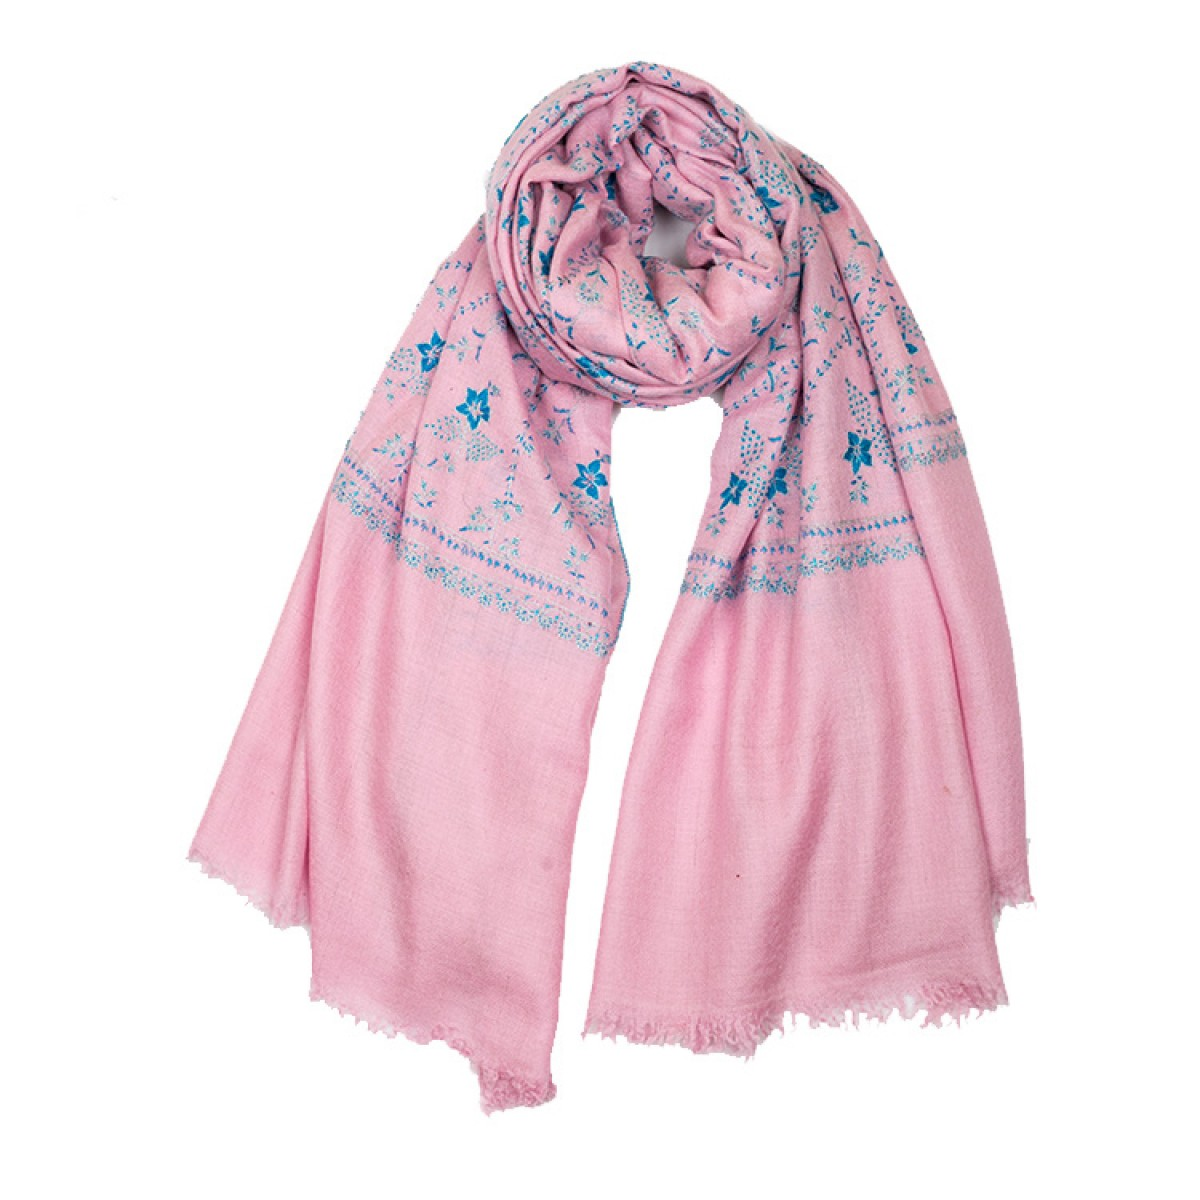 Embroidered Pashmina Shawl - Baby Pink